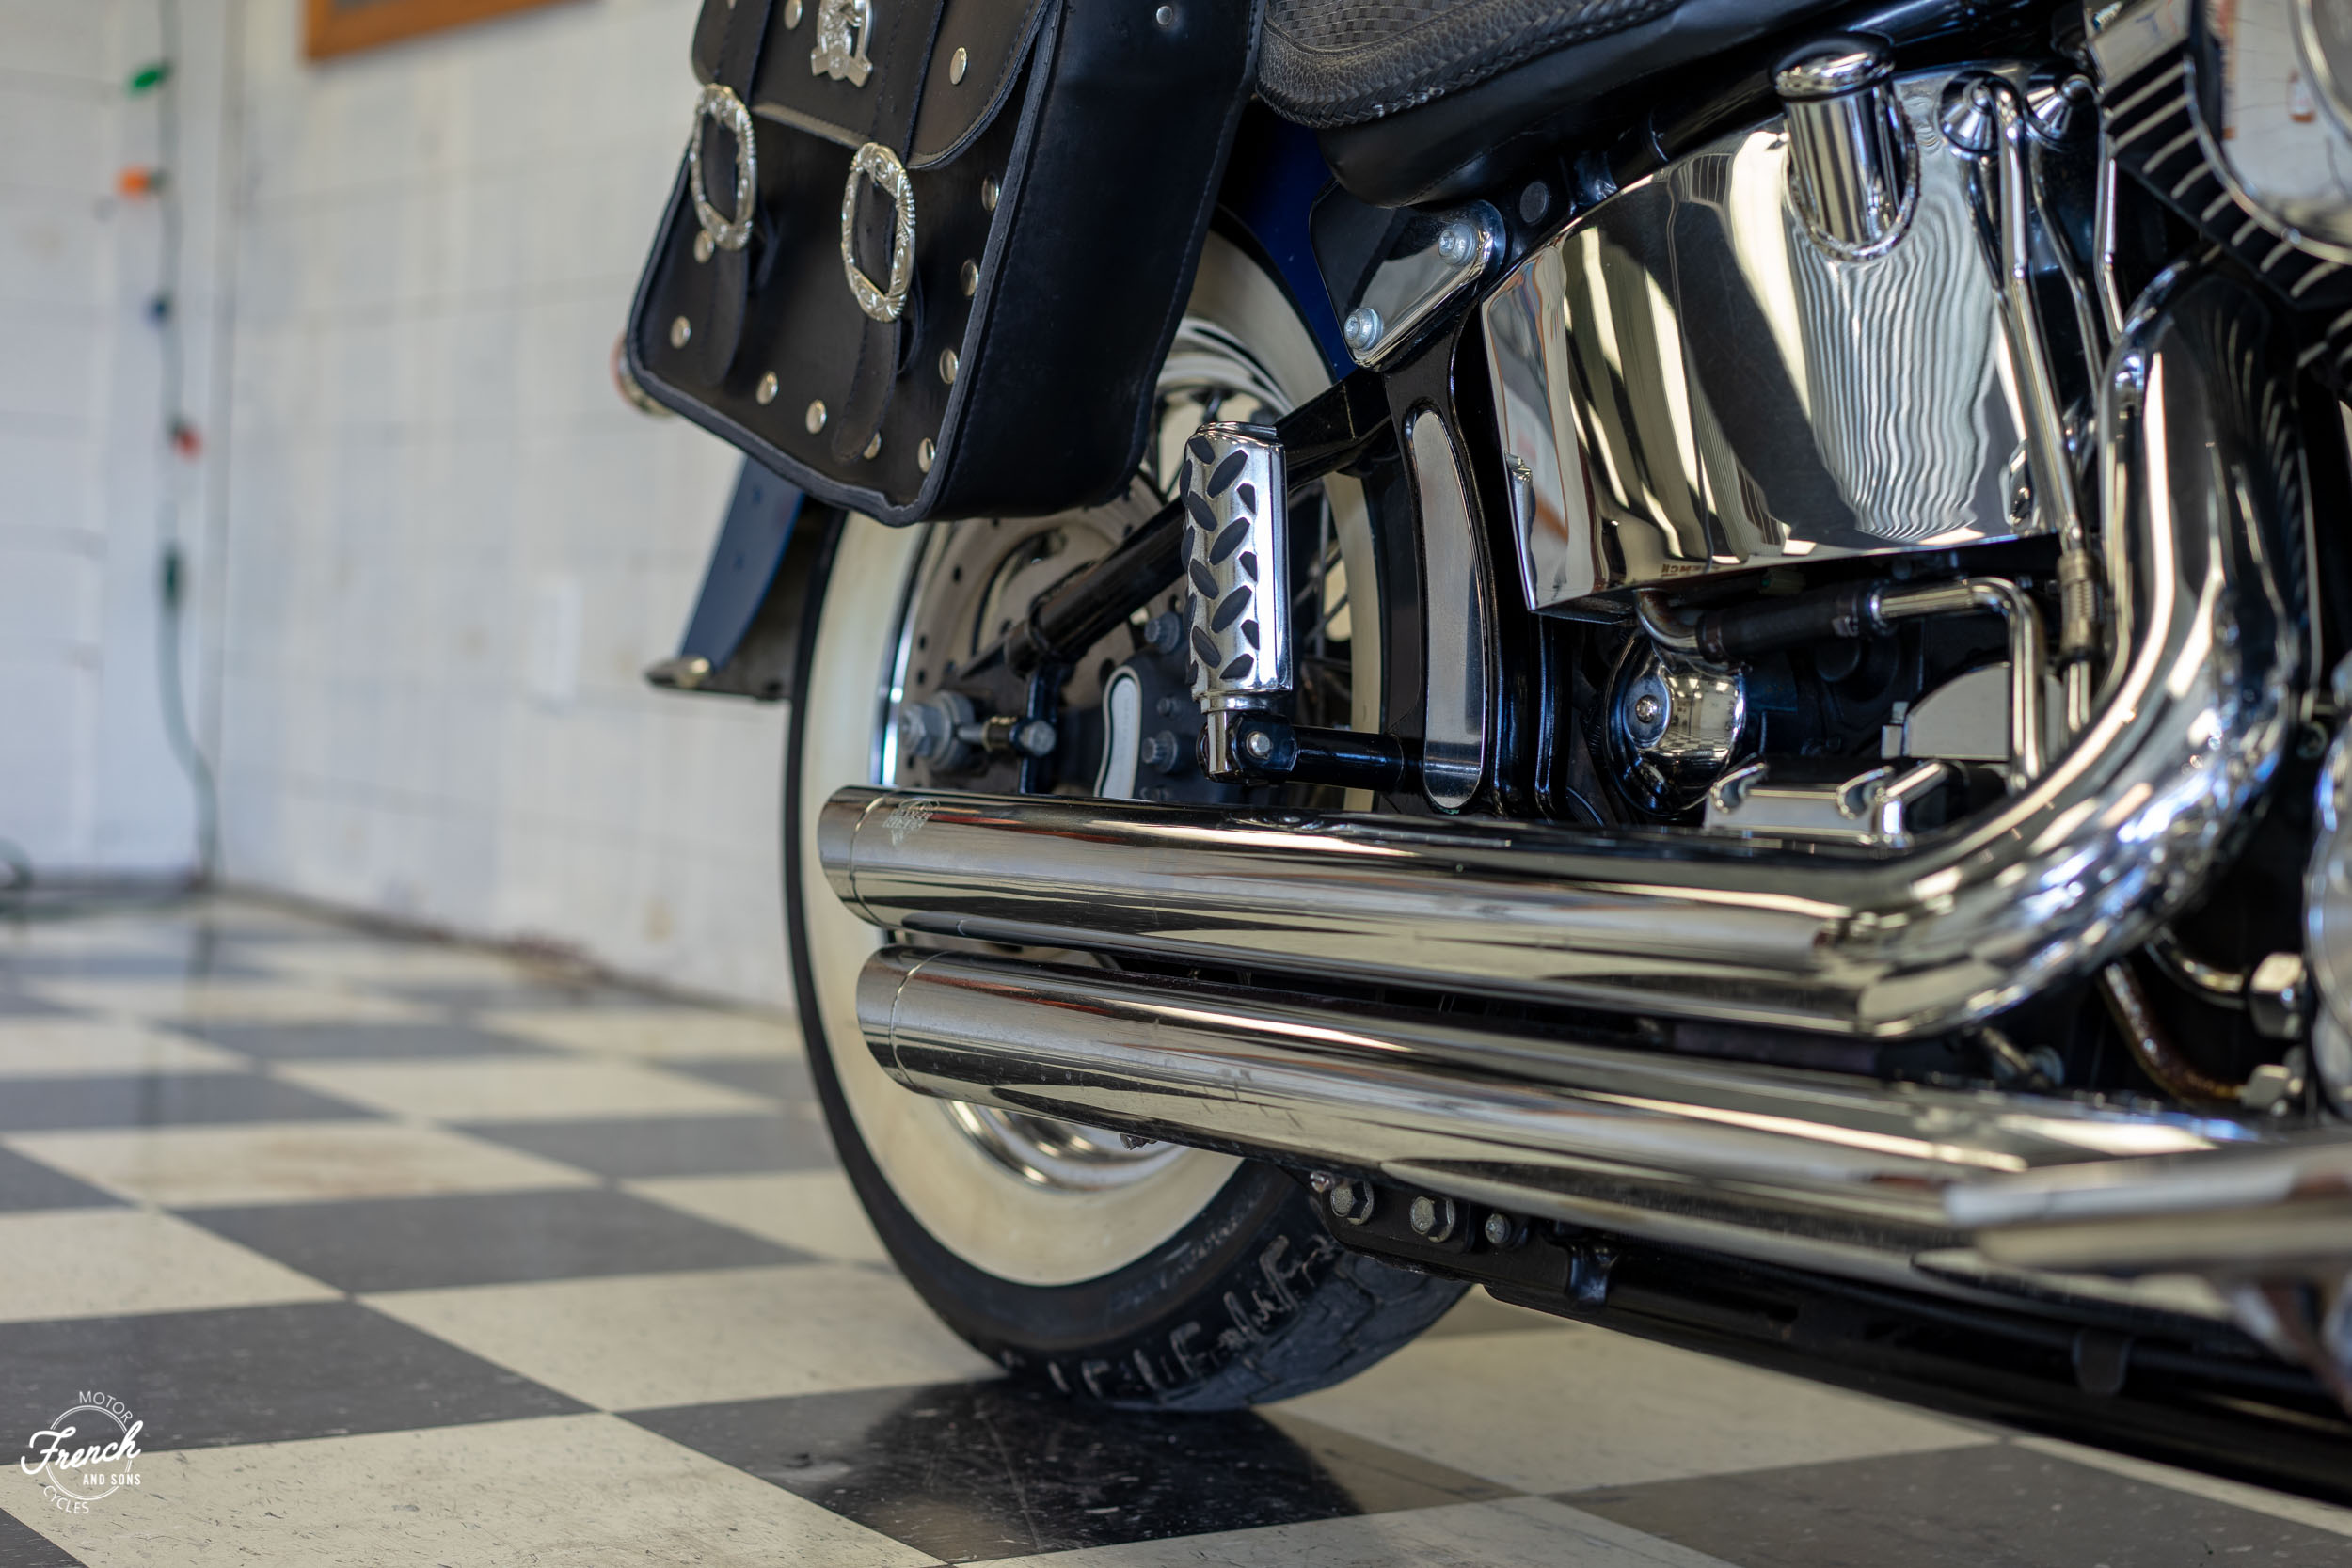 2005_Harley_Davidson_Softail_Deluxe-9.jpg